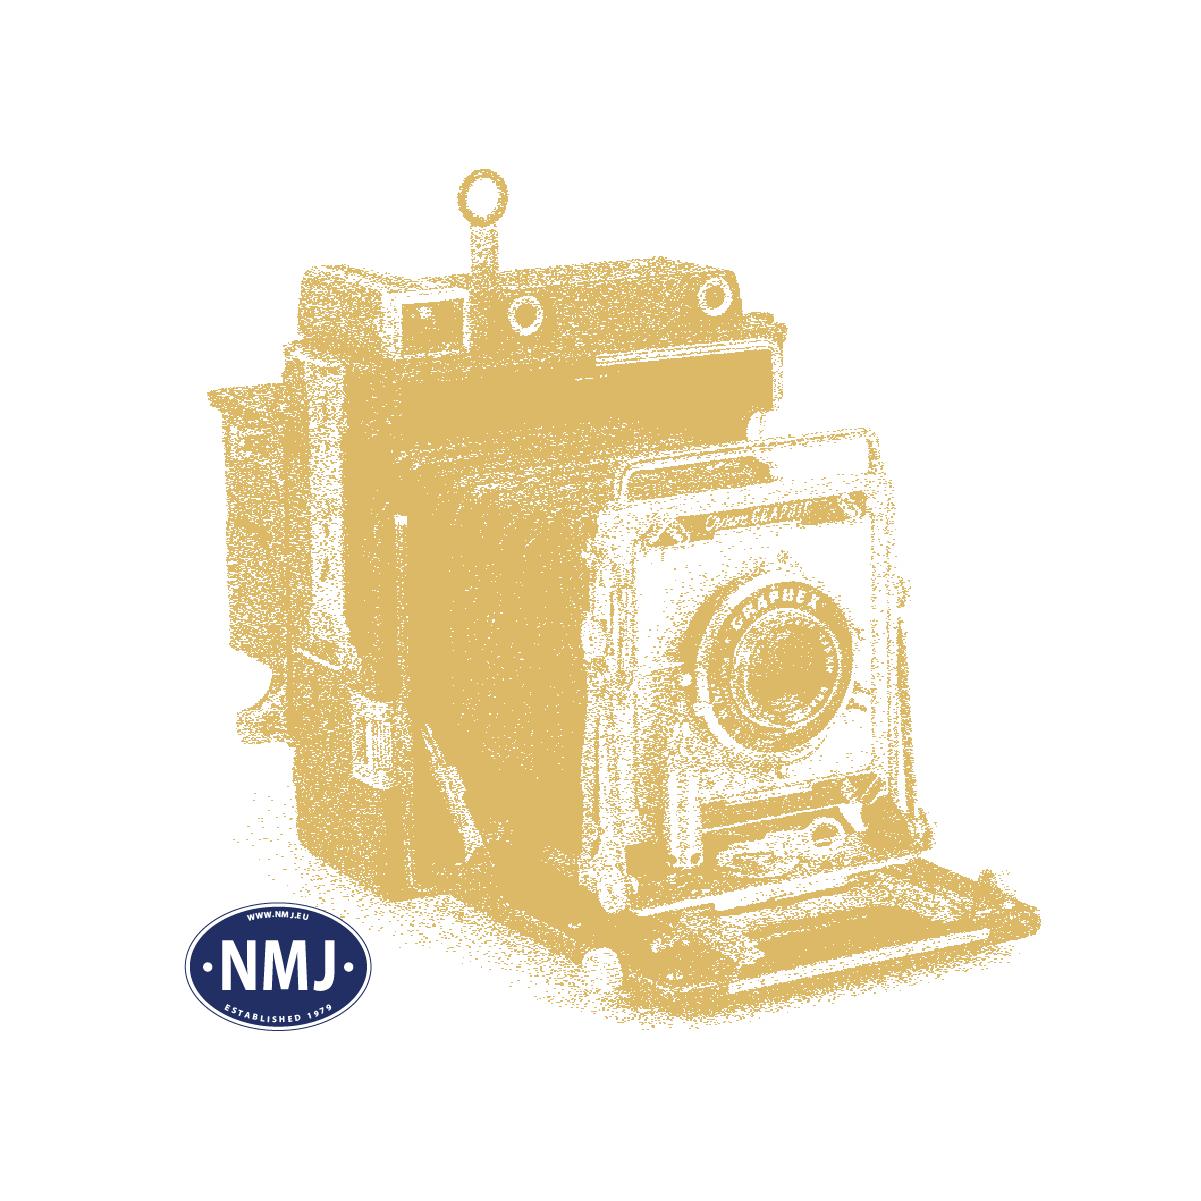 NMJT408.102 - NMJ Topline MAV Dms 85-91 100-6 Luggage